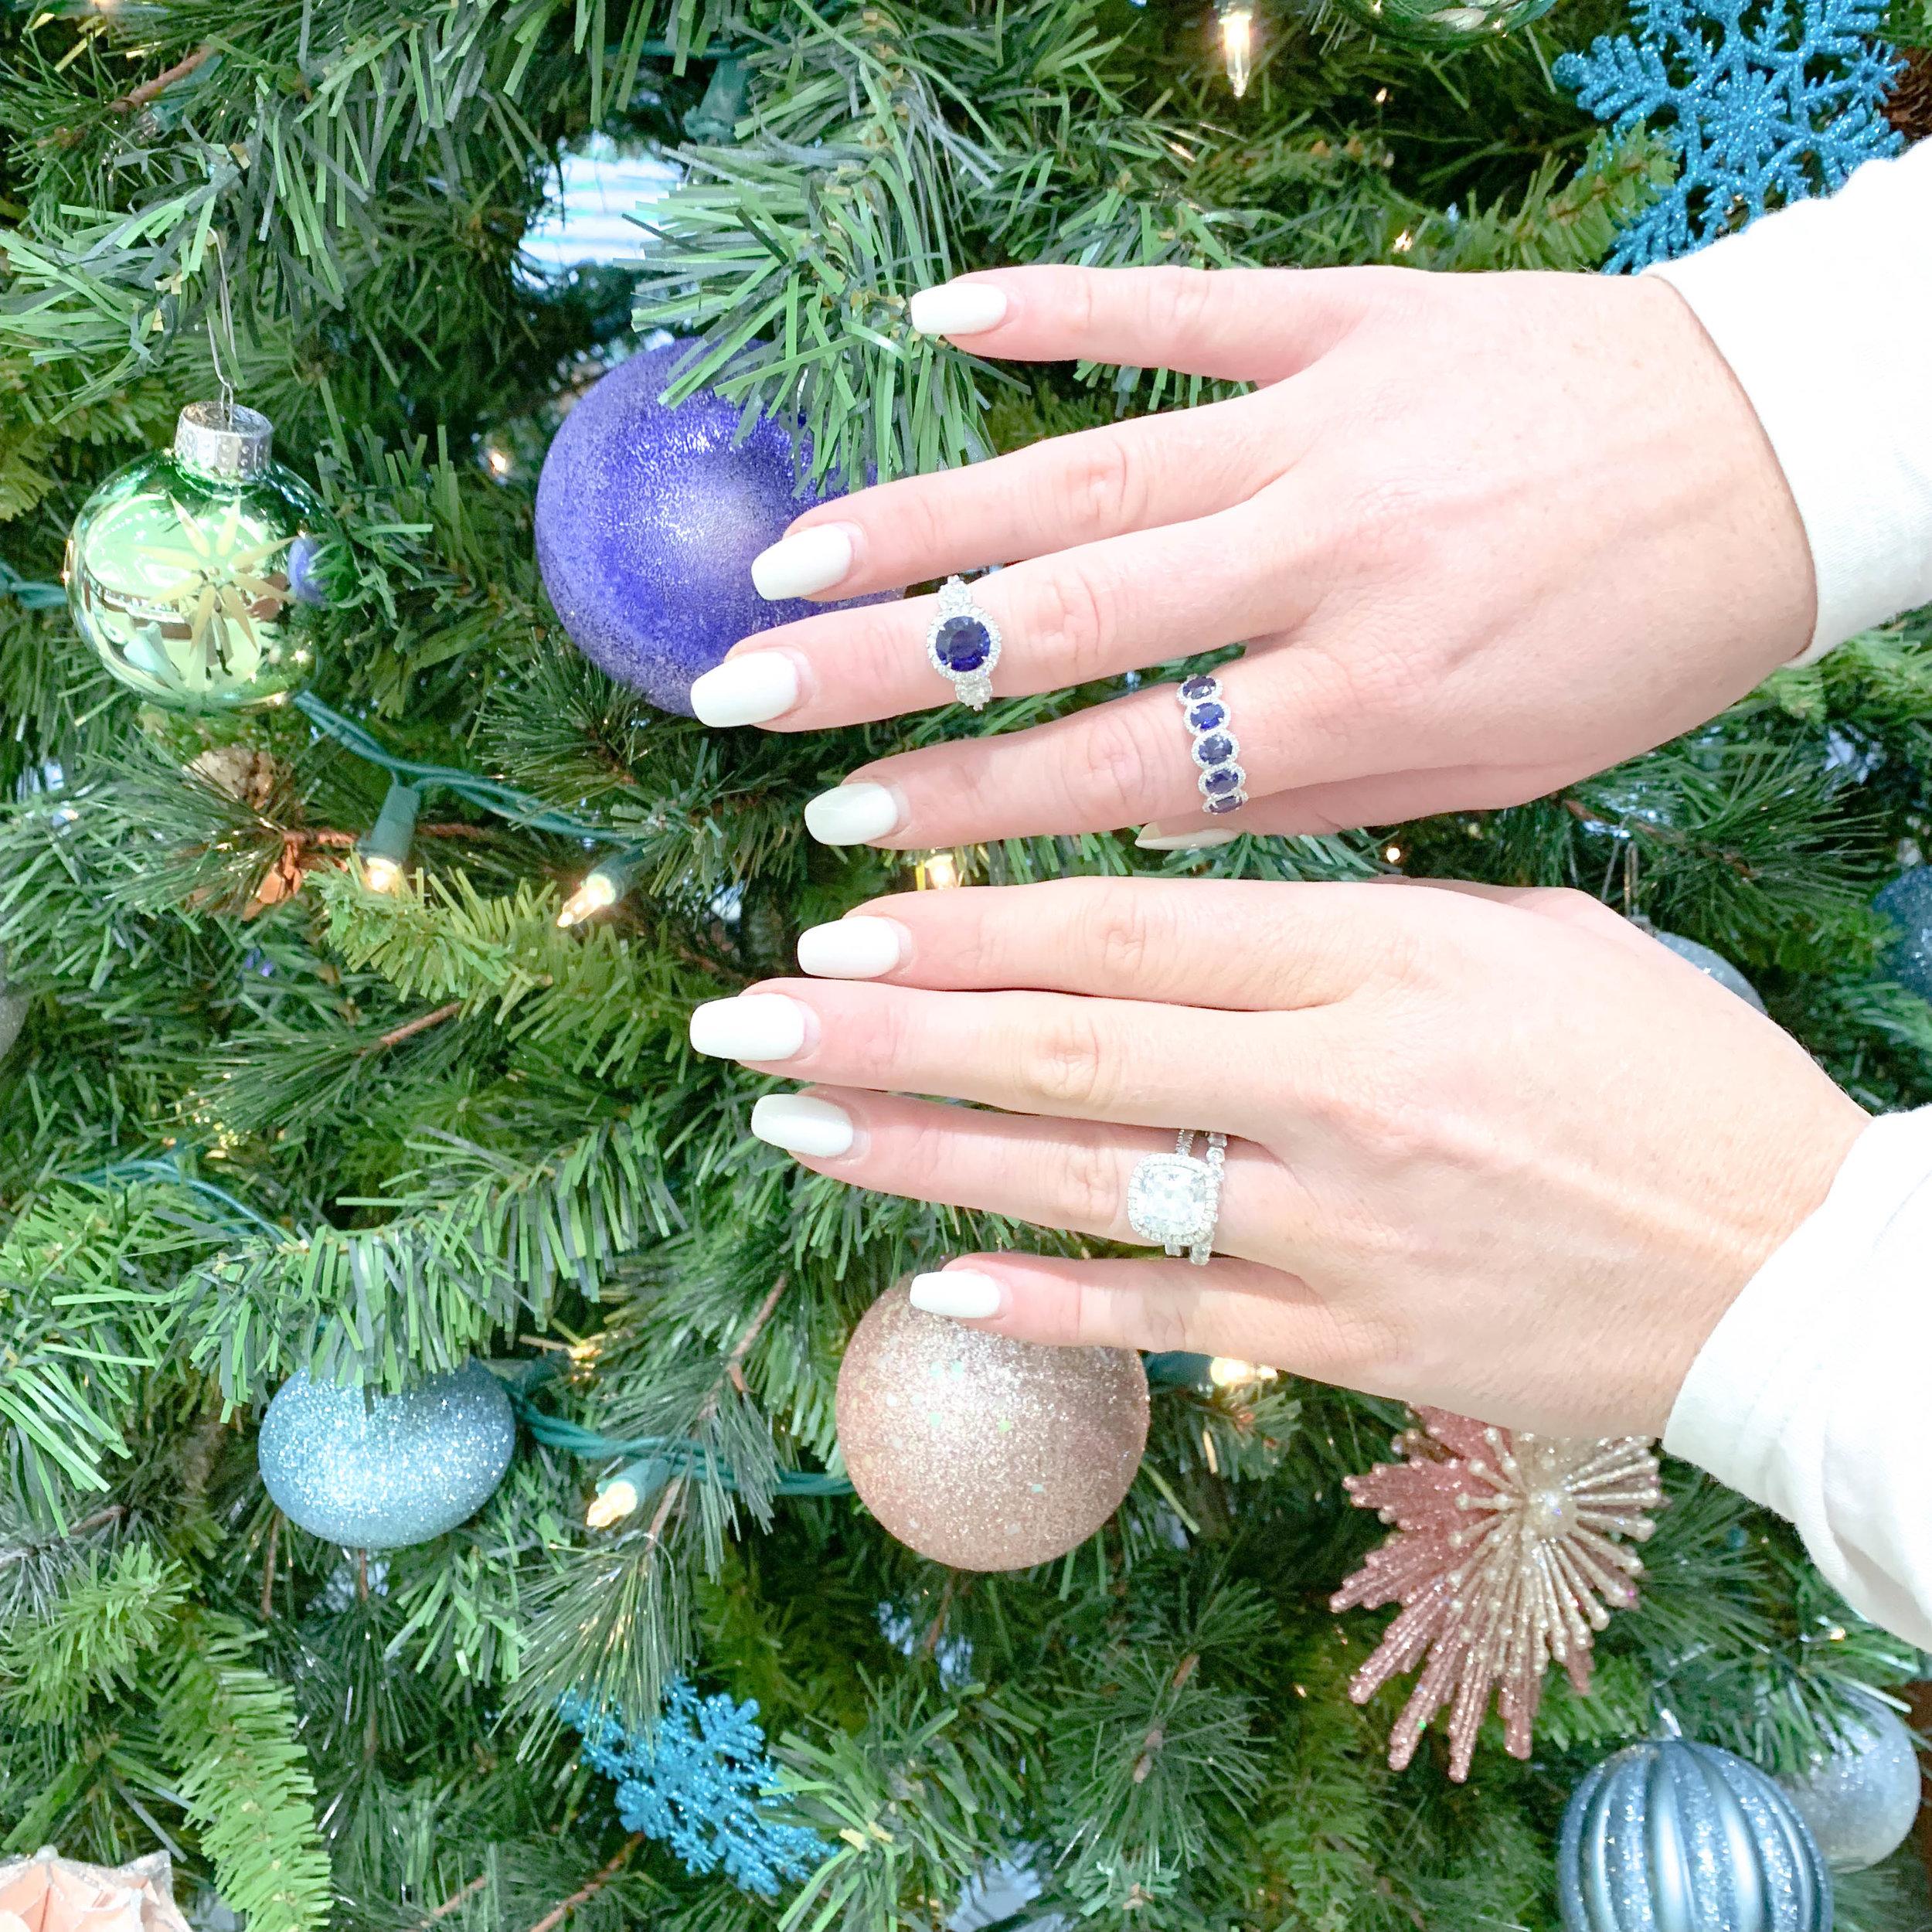 Caroline-Doll-jewelry-sapphires-christmas.jpg